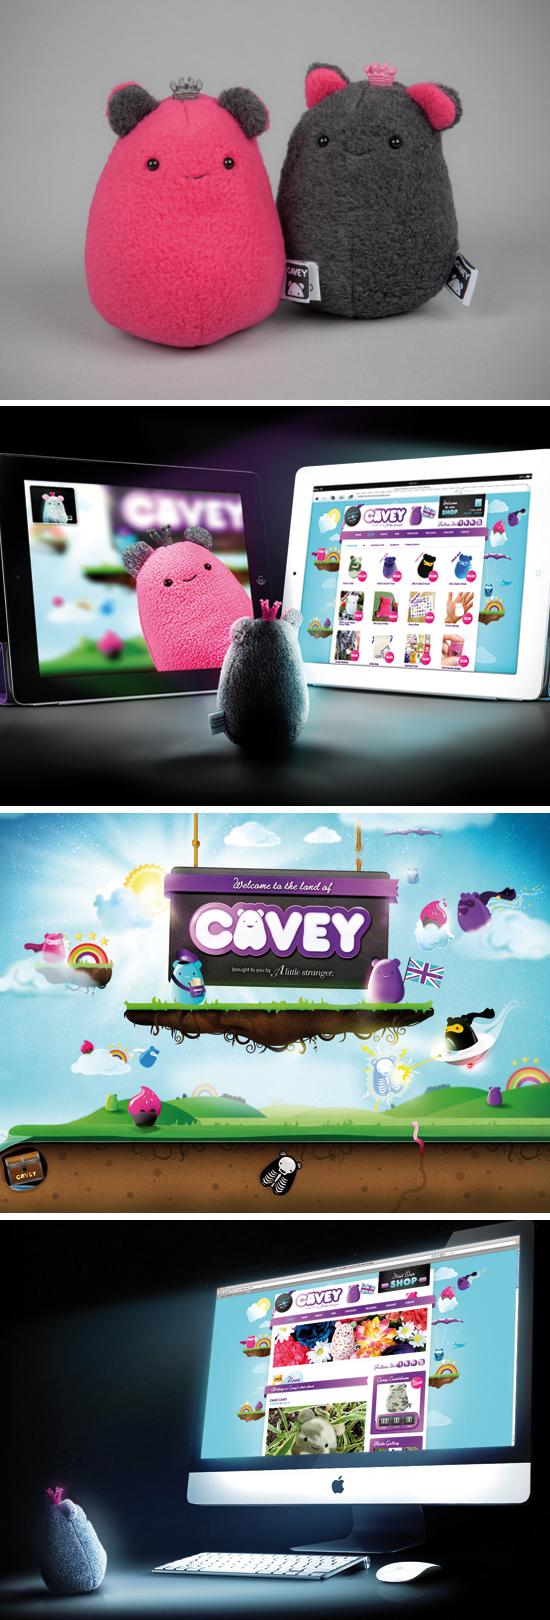 cavey_trip